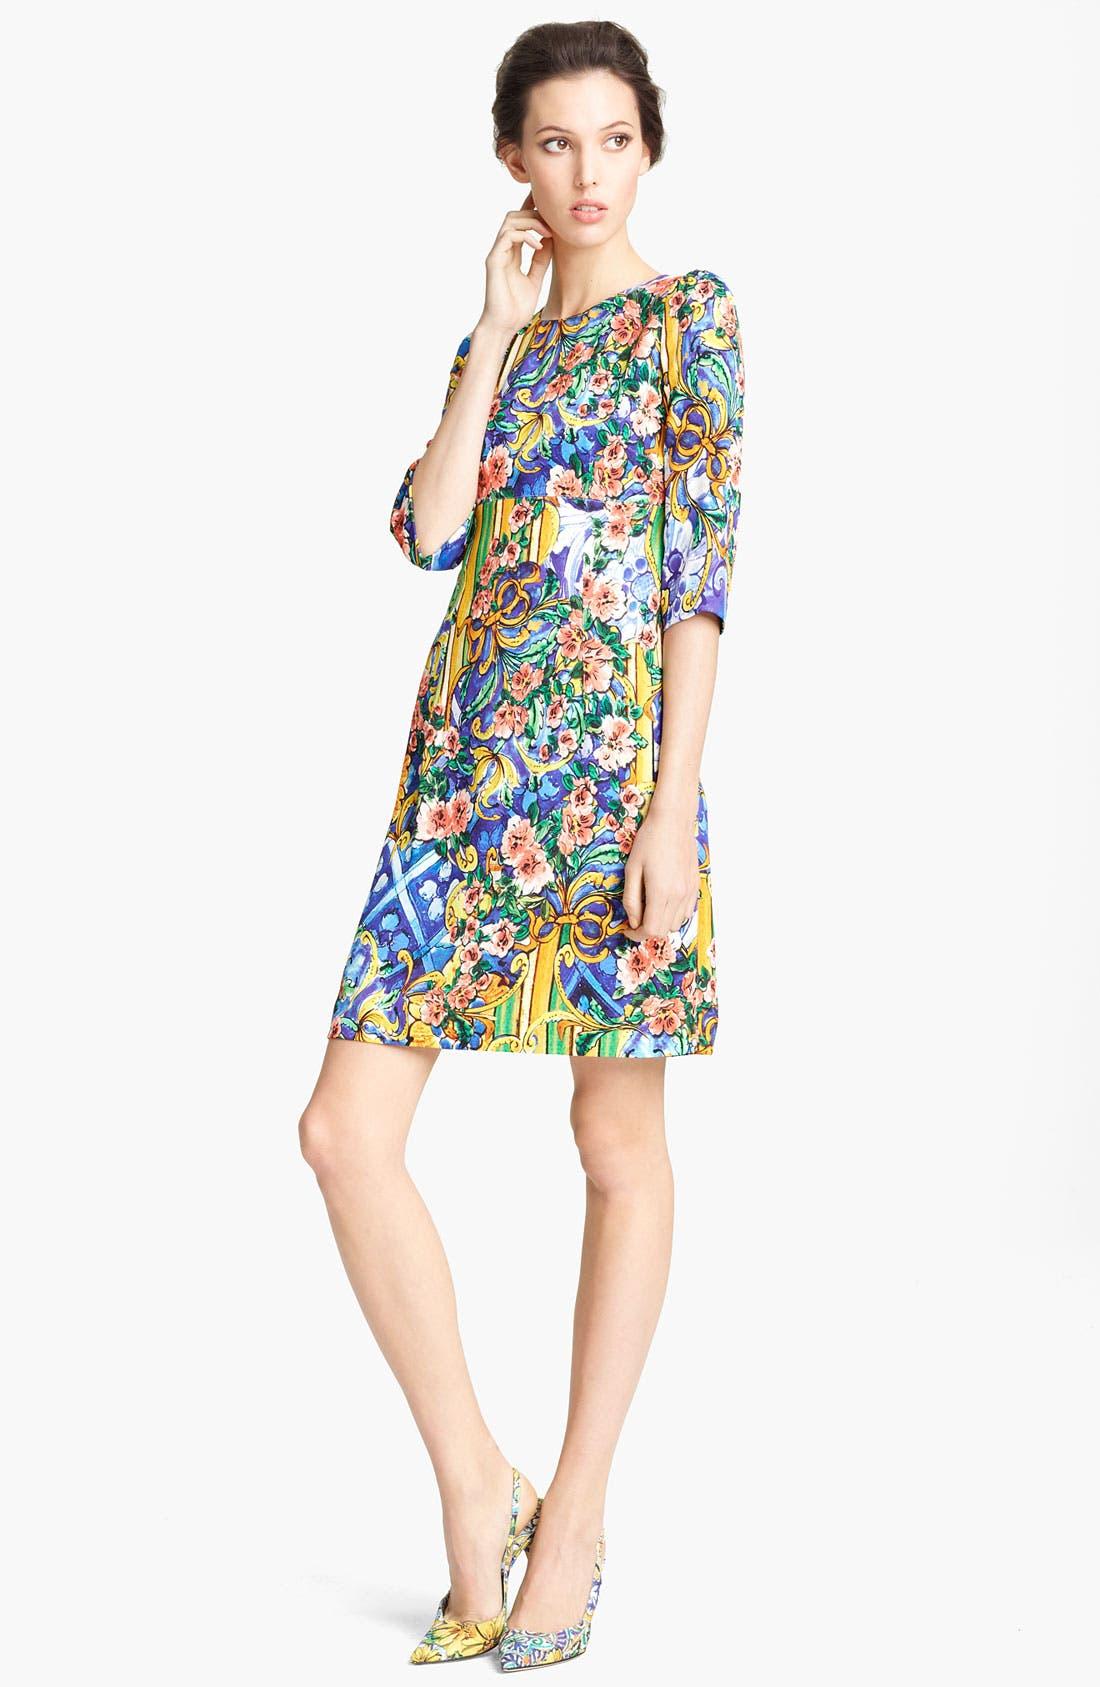 Main Image - Dolce&Gabbana Floral Print Stretch Cady Dress